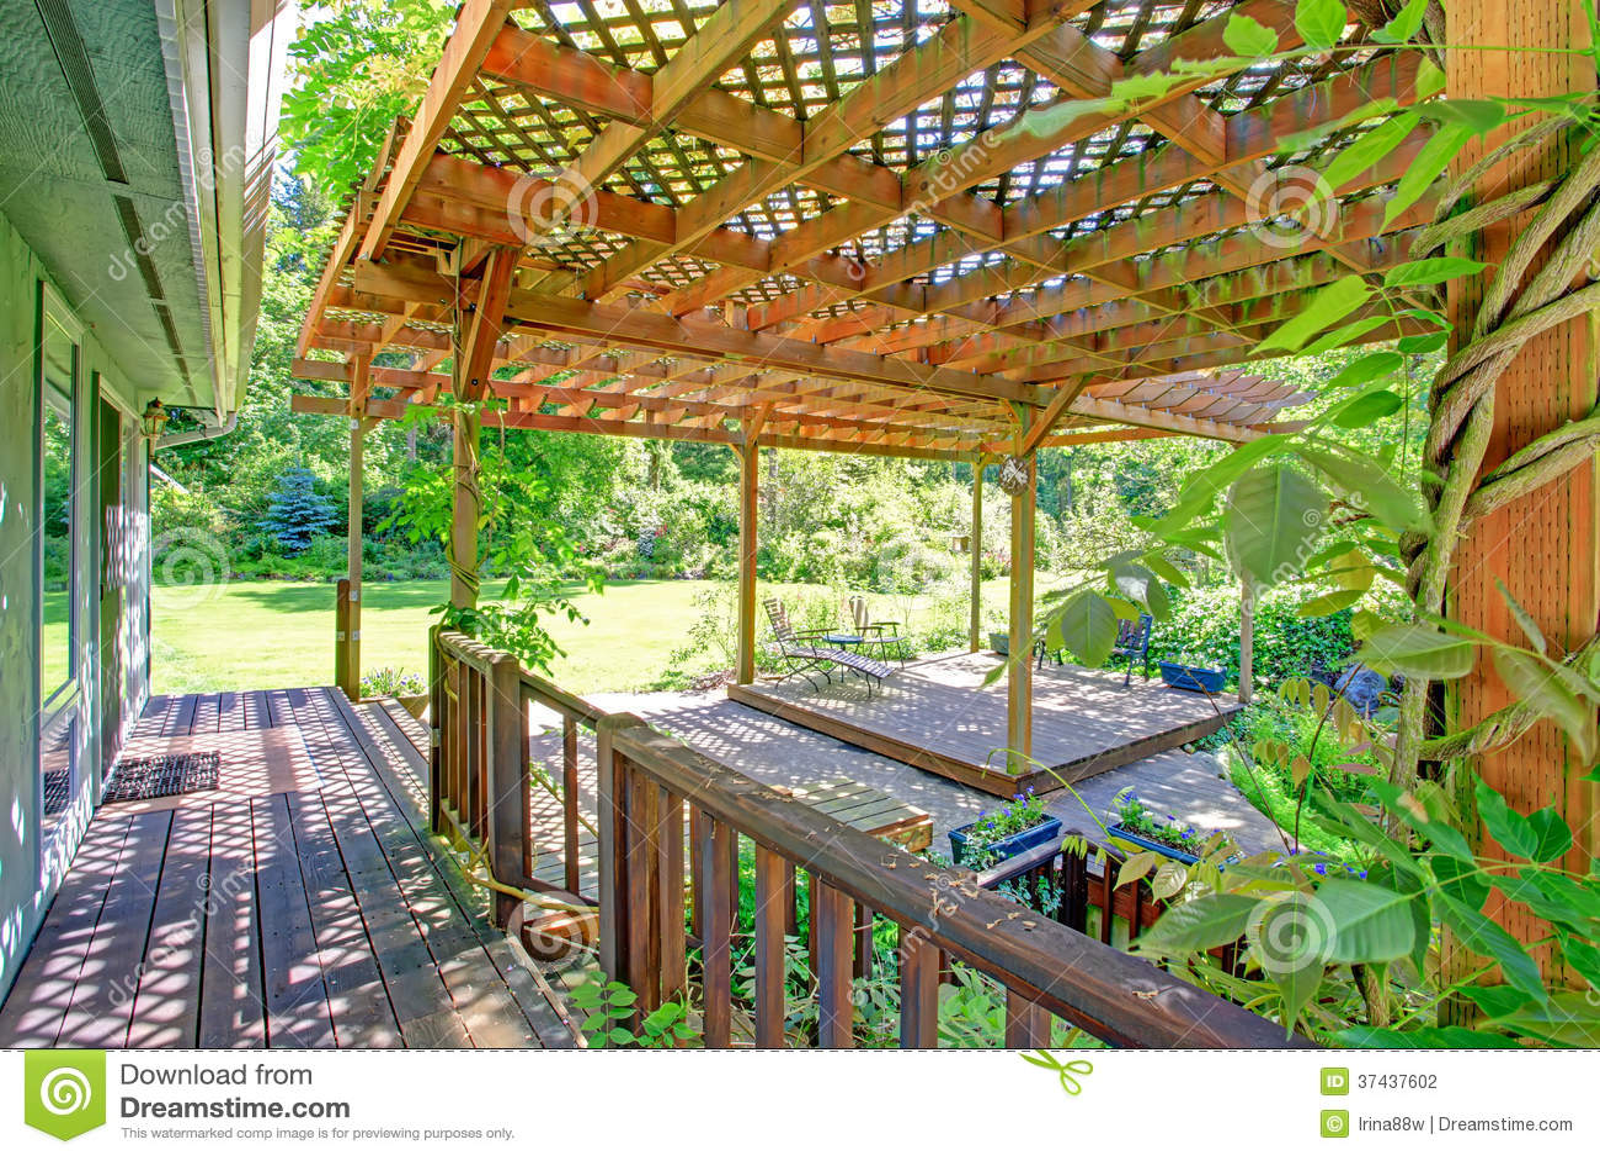 Backyard Farm Deck With Attached Open Pergola Stock Photo